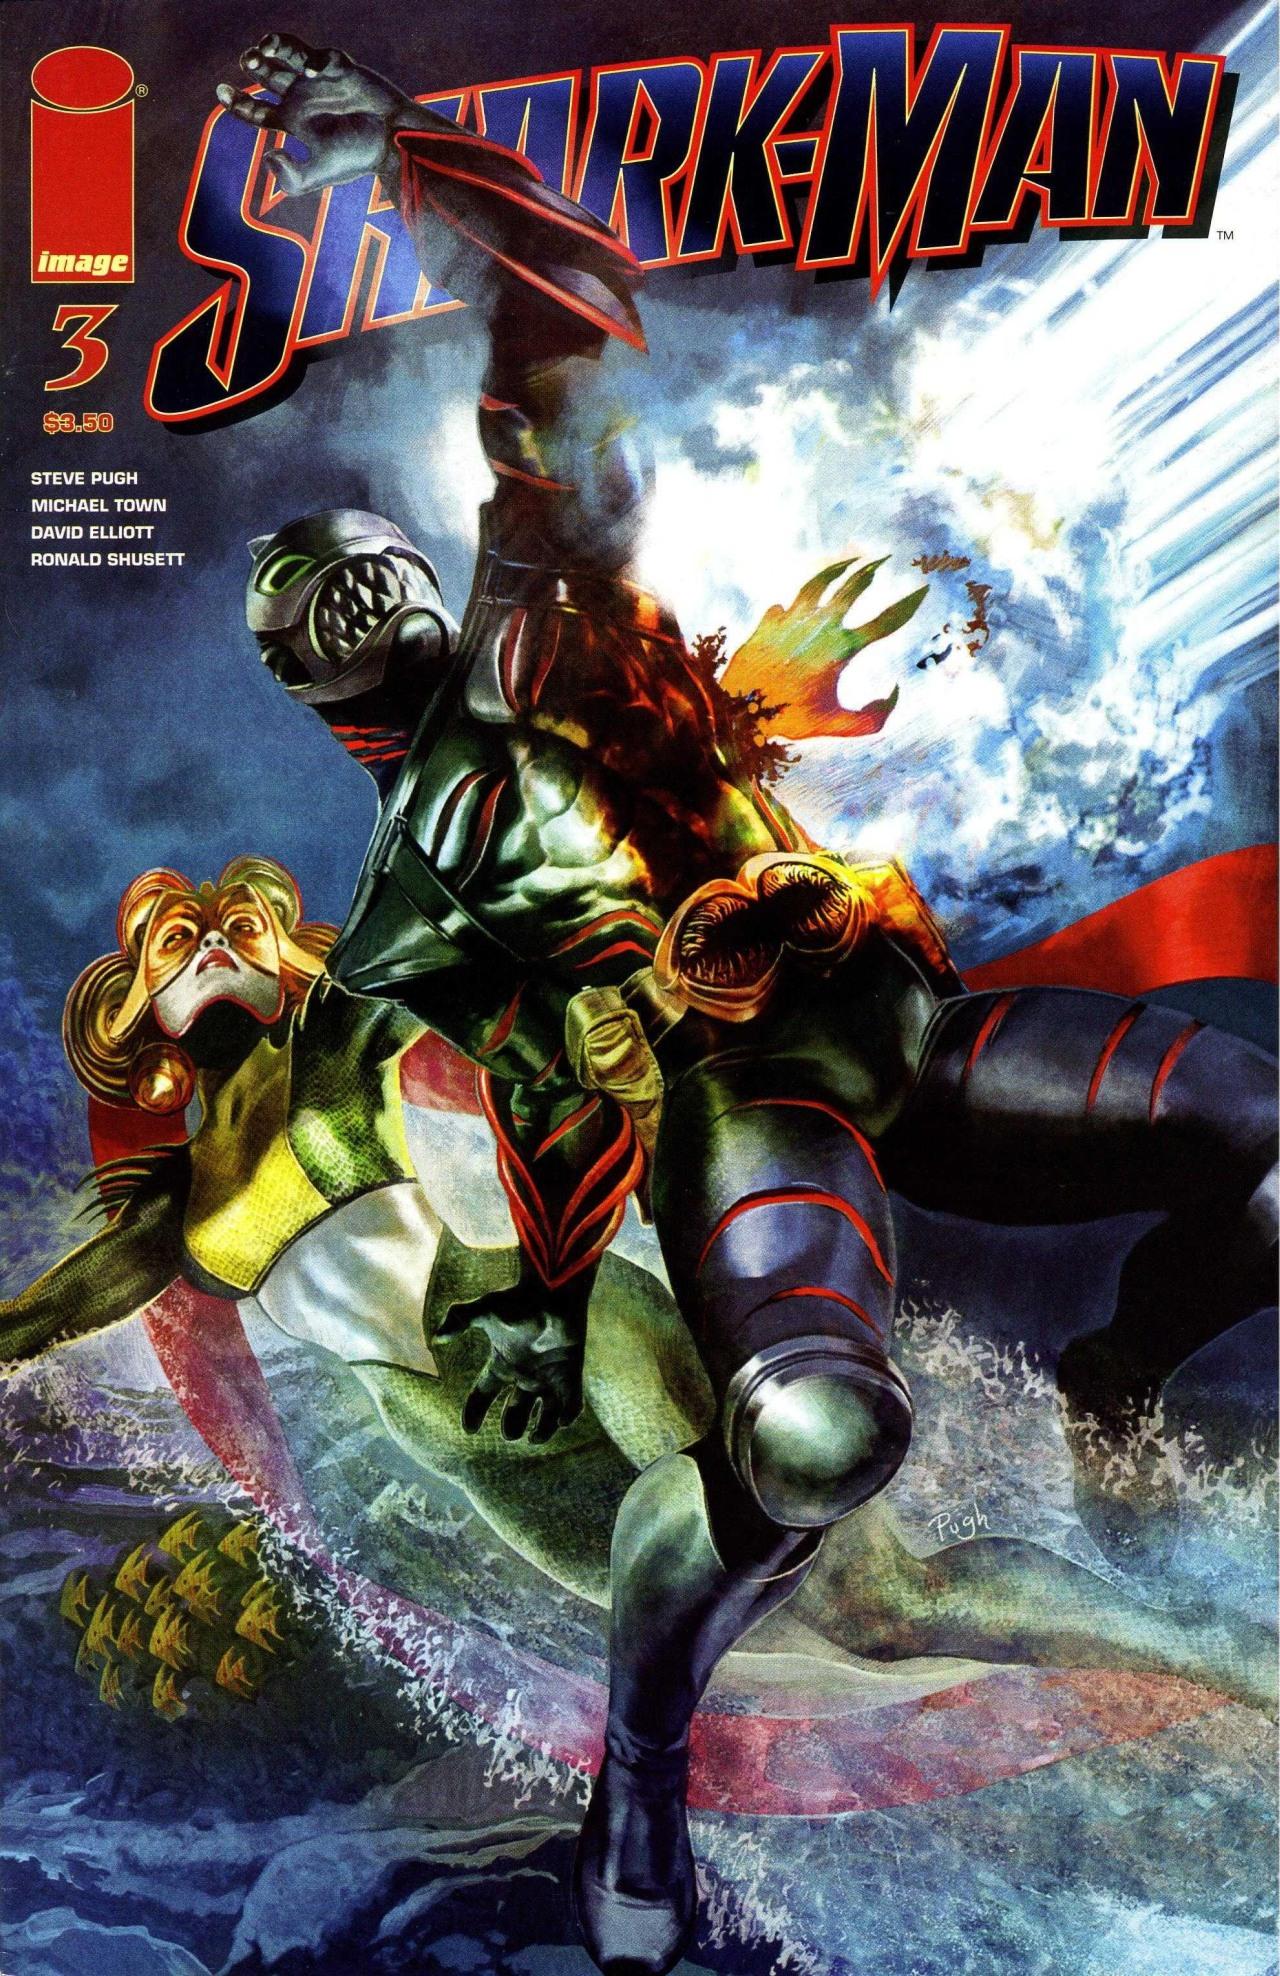 Read online Shark-Man comic -  Issue #3 - 1